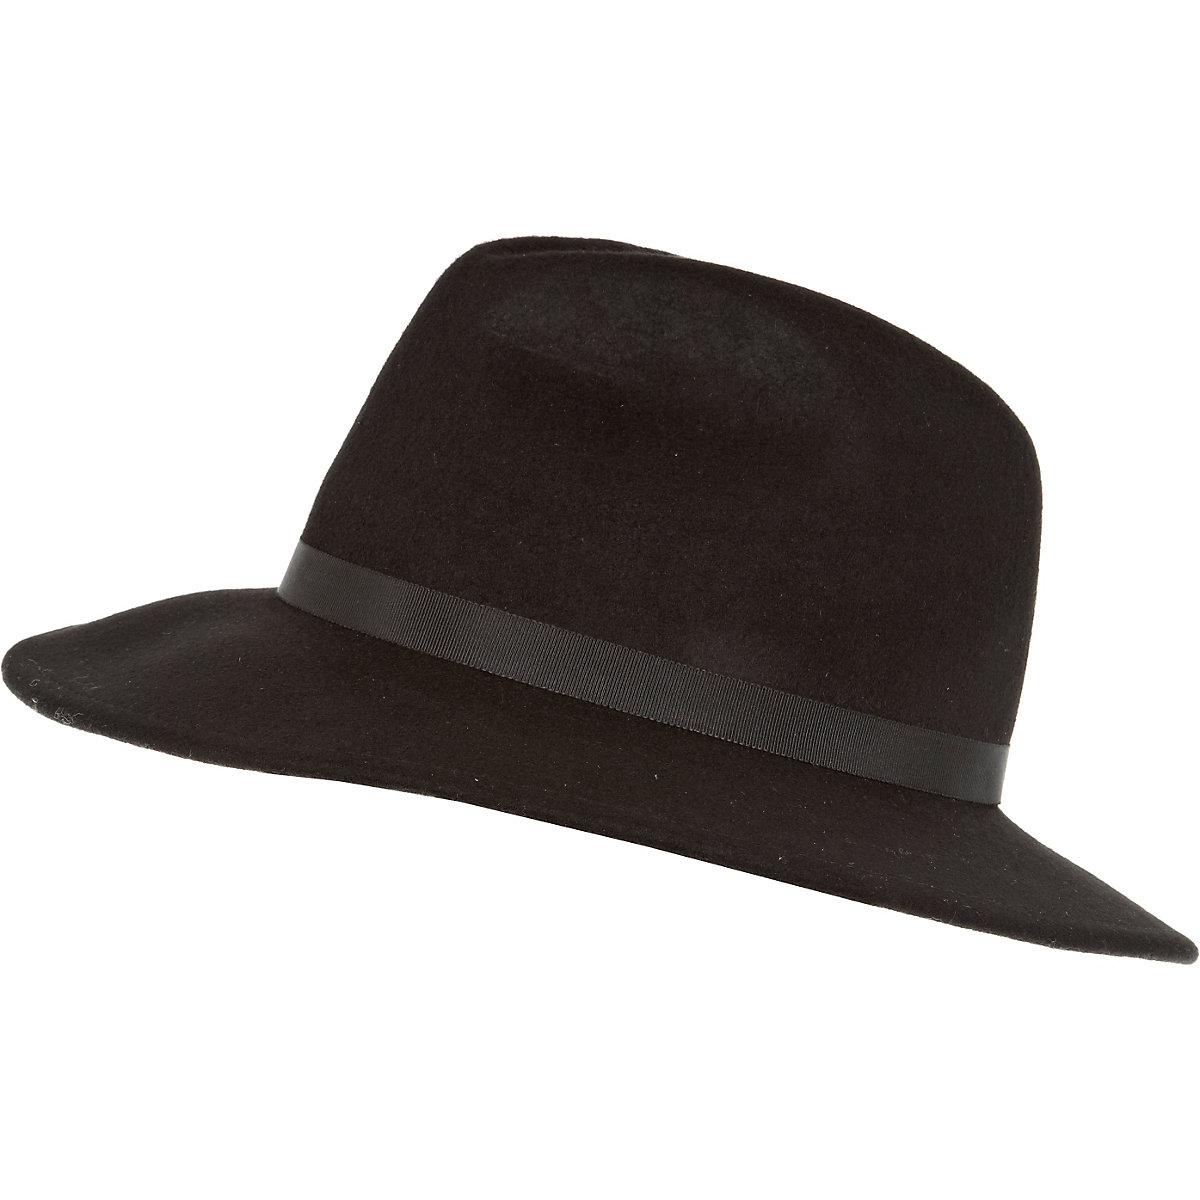 Black ribbon trim fedora hat